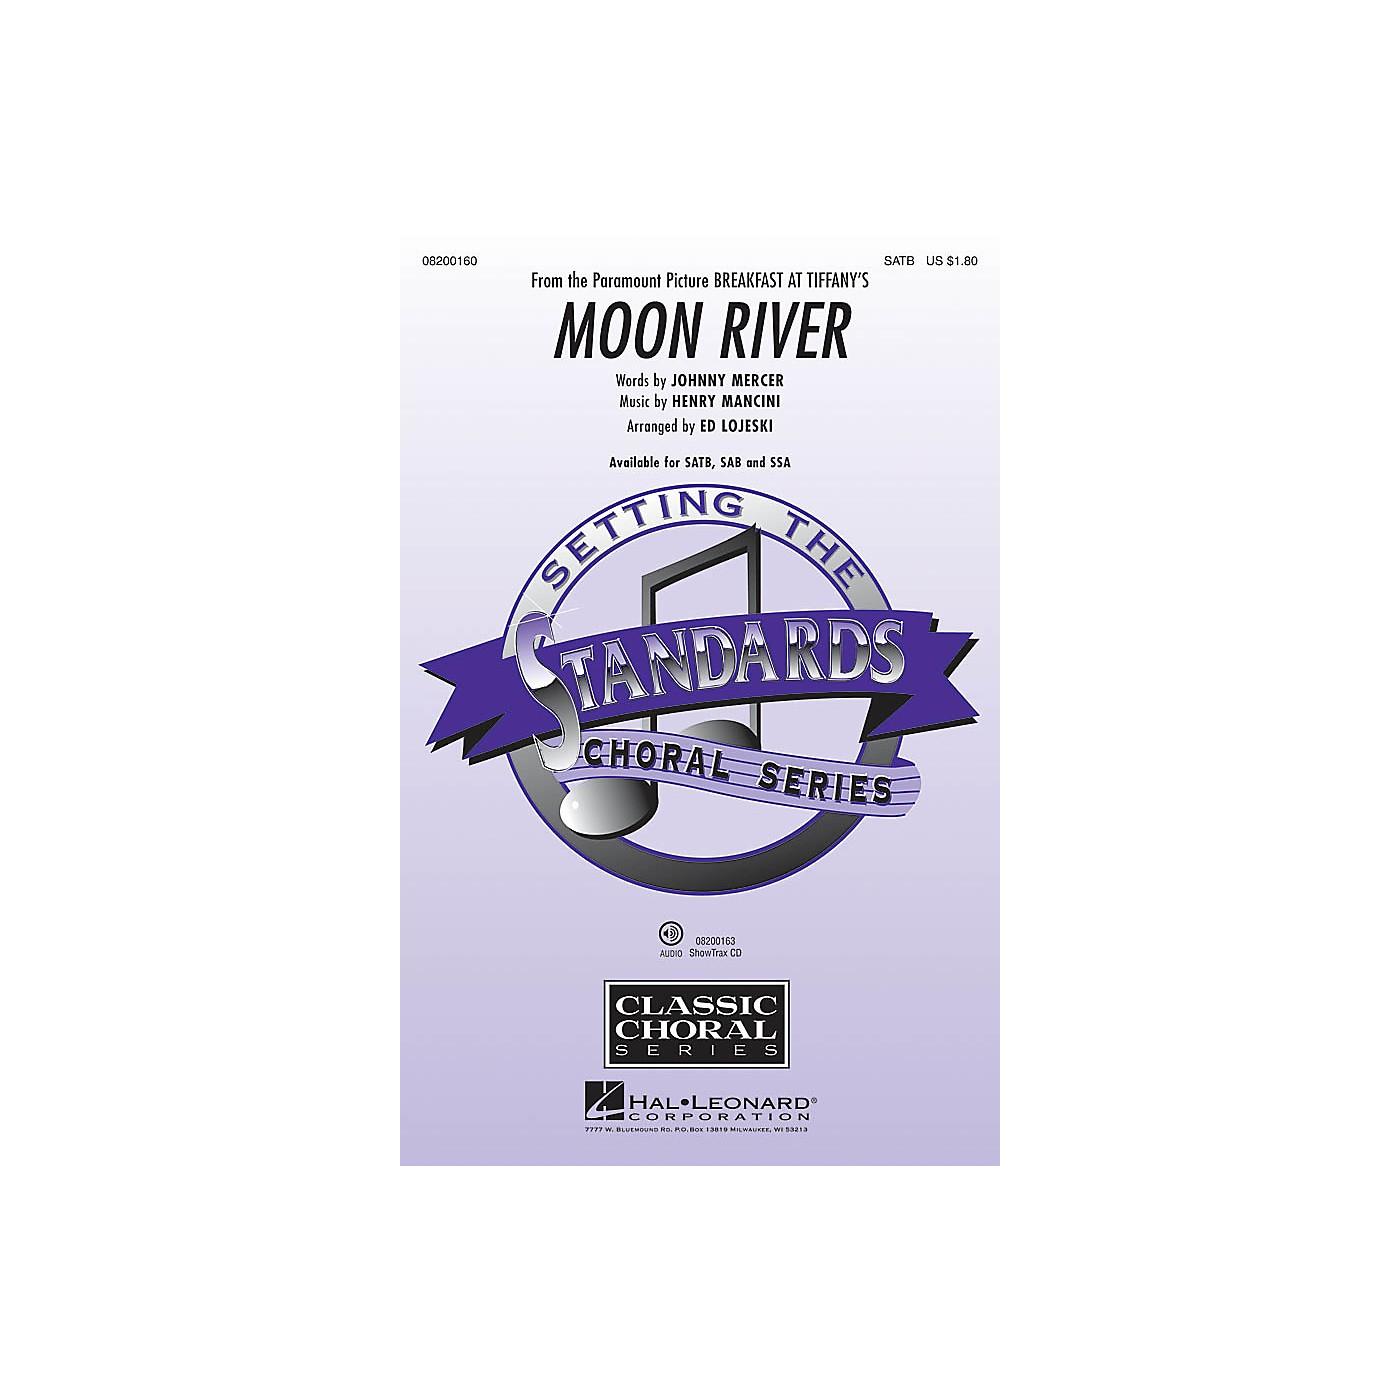 Hal Leonard Moon River (from Breakfast at Tiffany's) SATB arranged by Ed Lojeski thumbnail